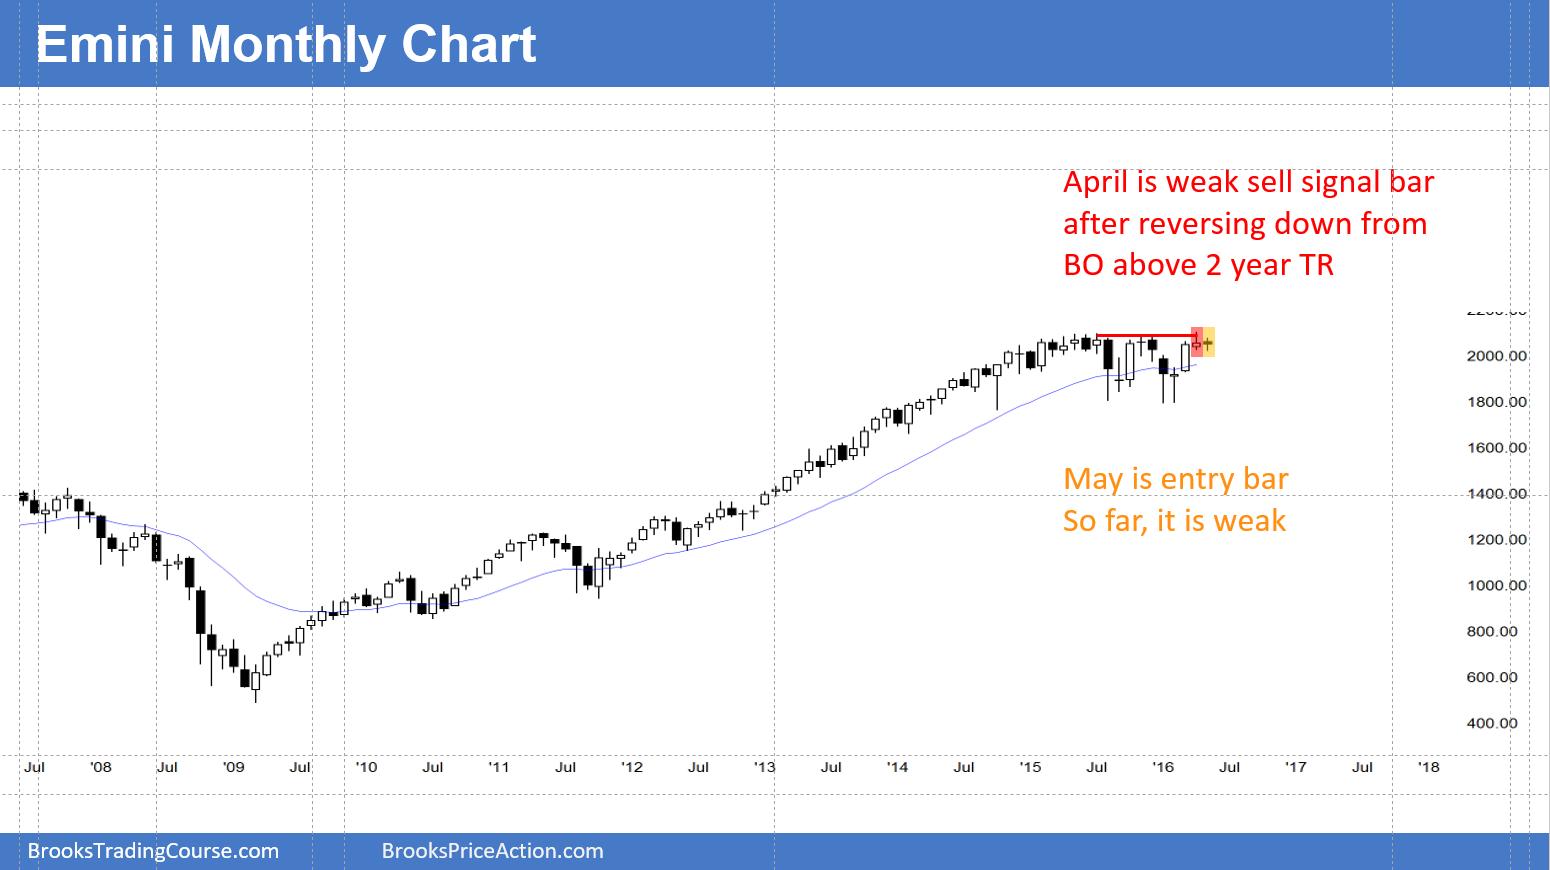 Emini trading signals live